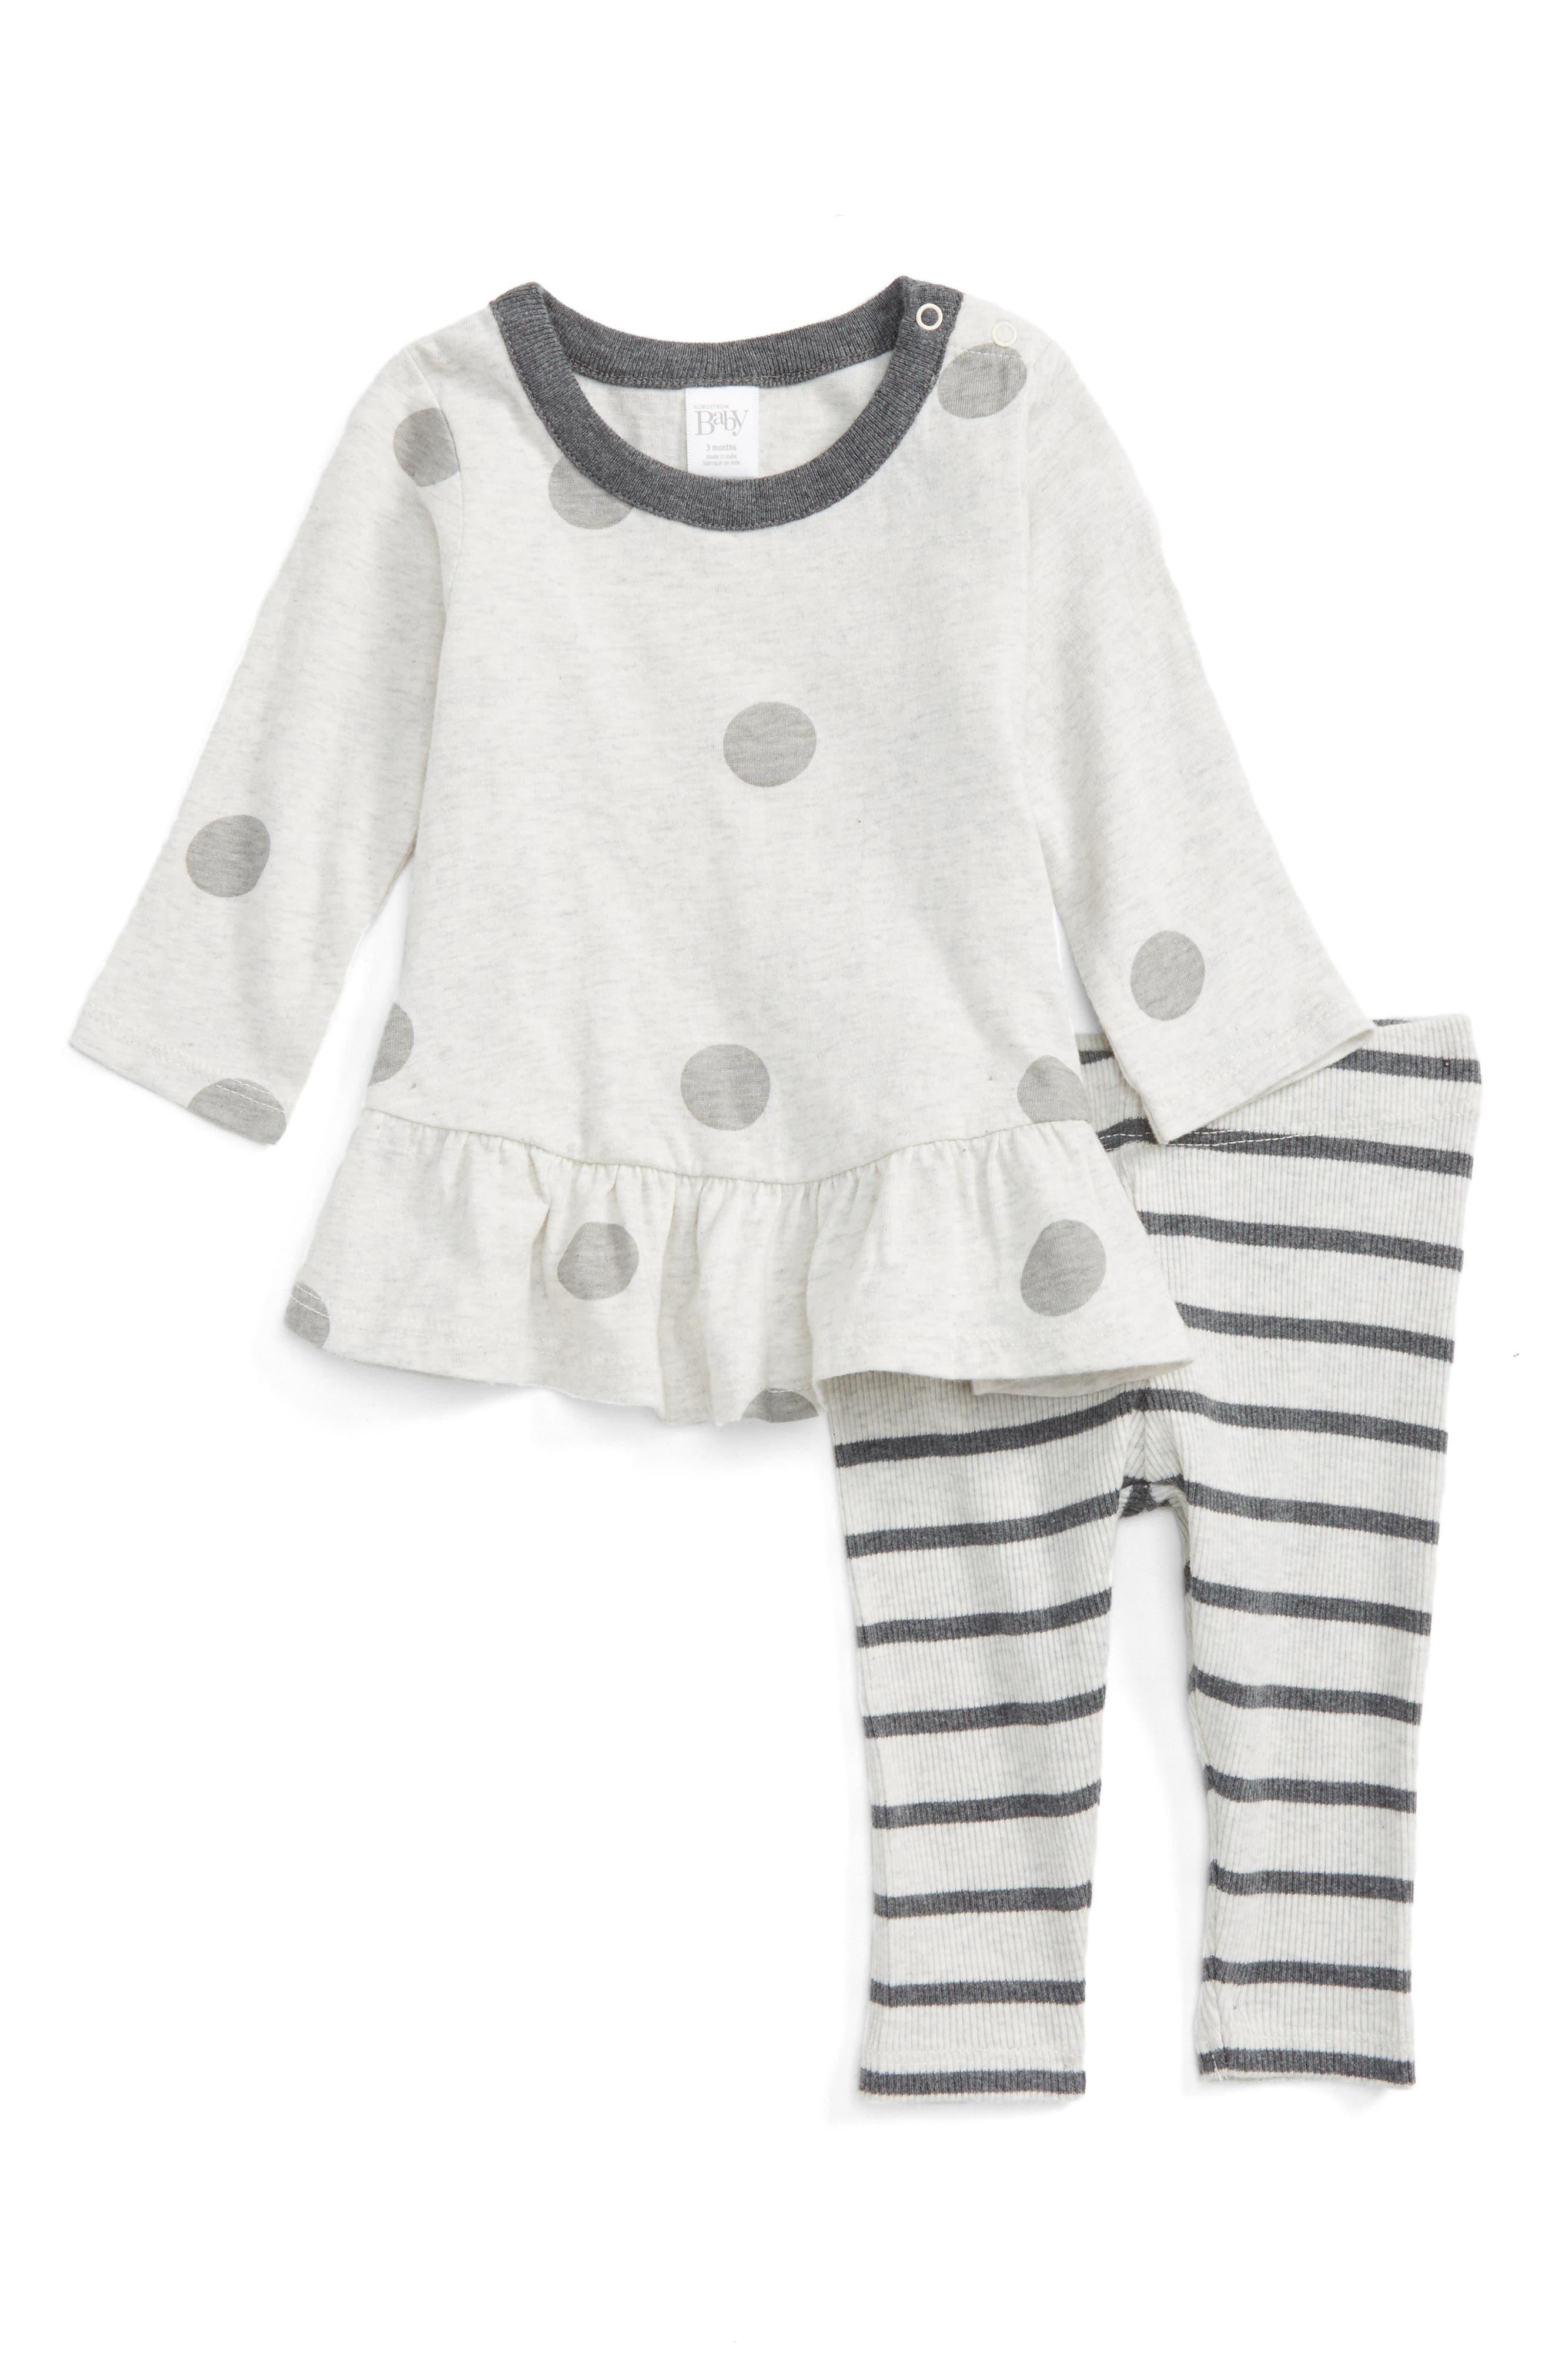 Main Image - Nordstrom Baby Polka Dot Peplum Tunic & Stripe Leggings Set (Baby Girls)